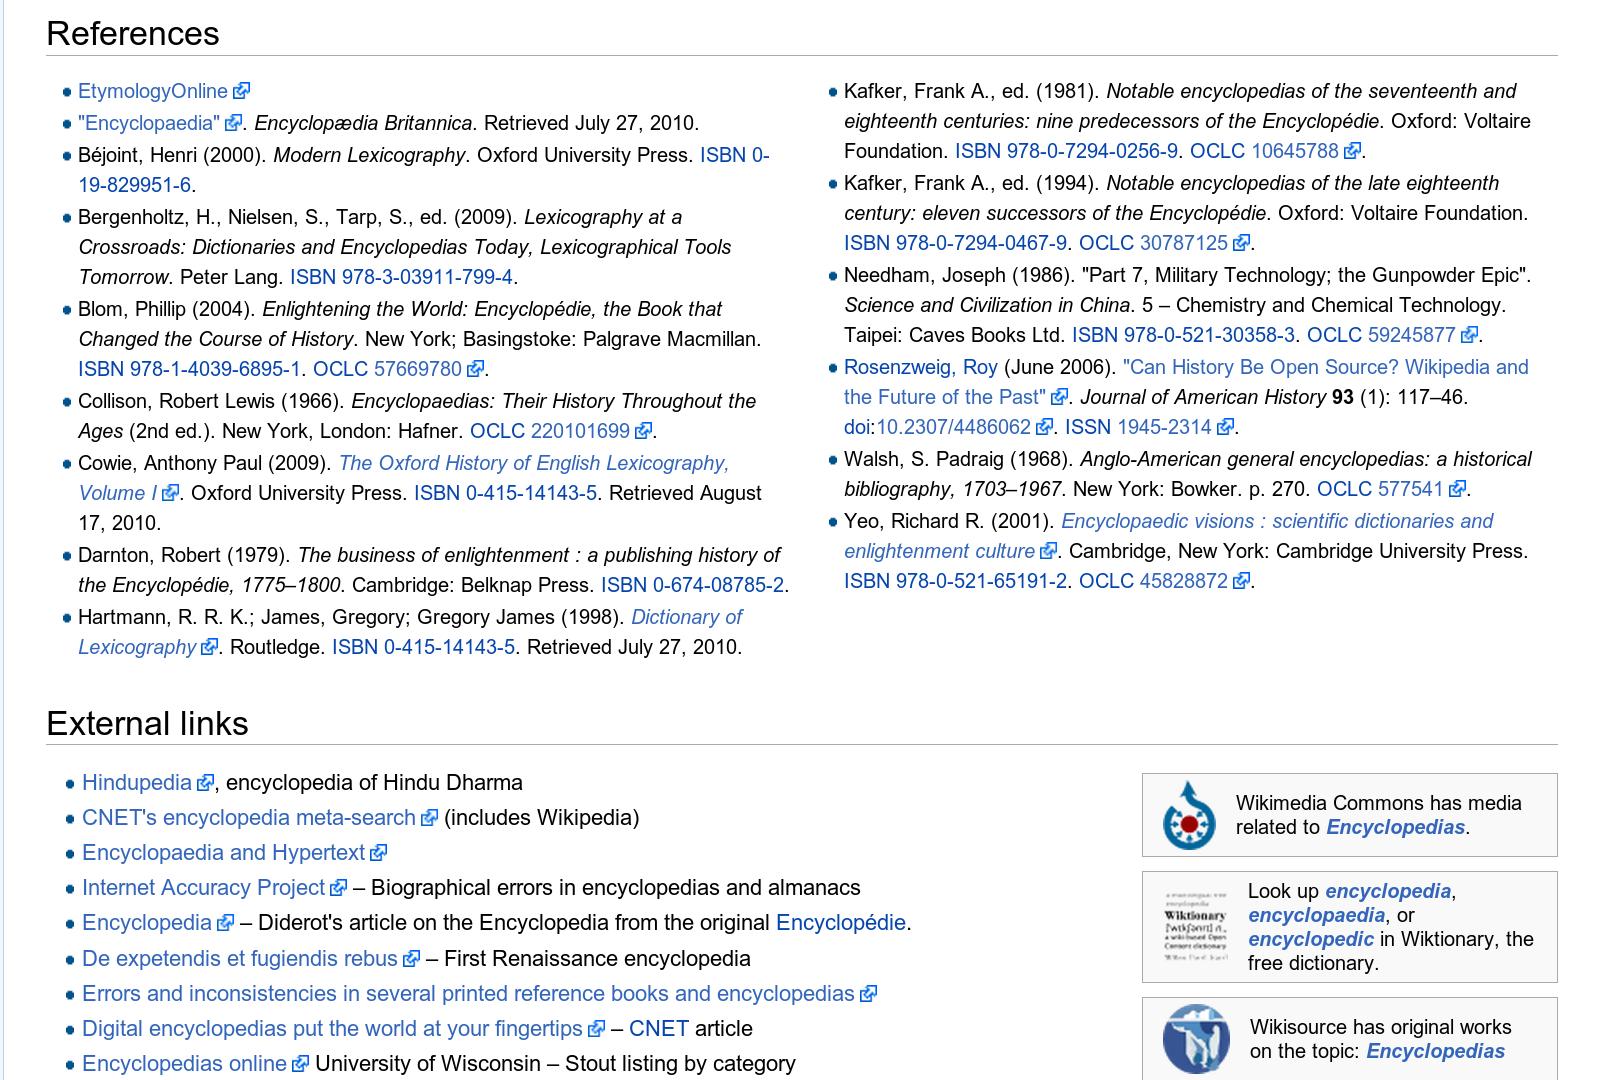 file editing screenshot p encyclopedia references file editing screenshot p 10 encyclopedia references and external links png